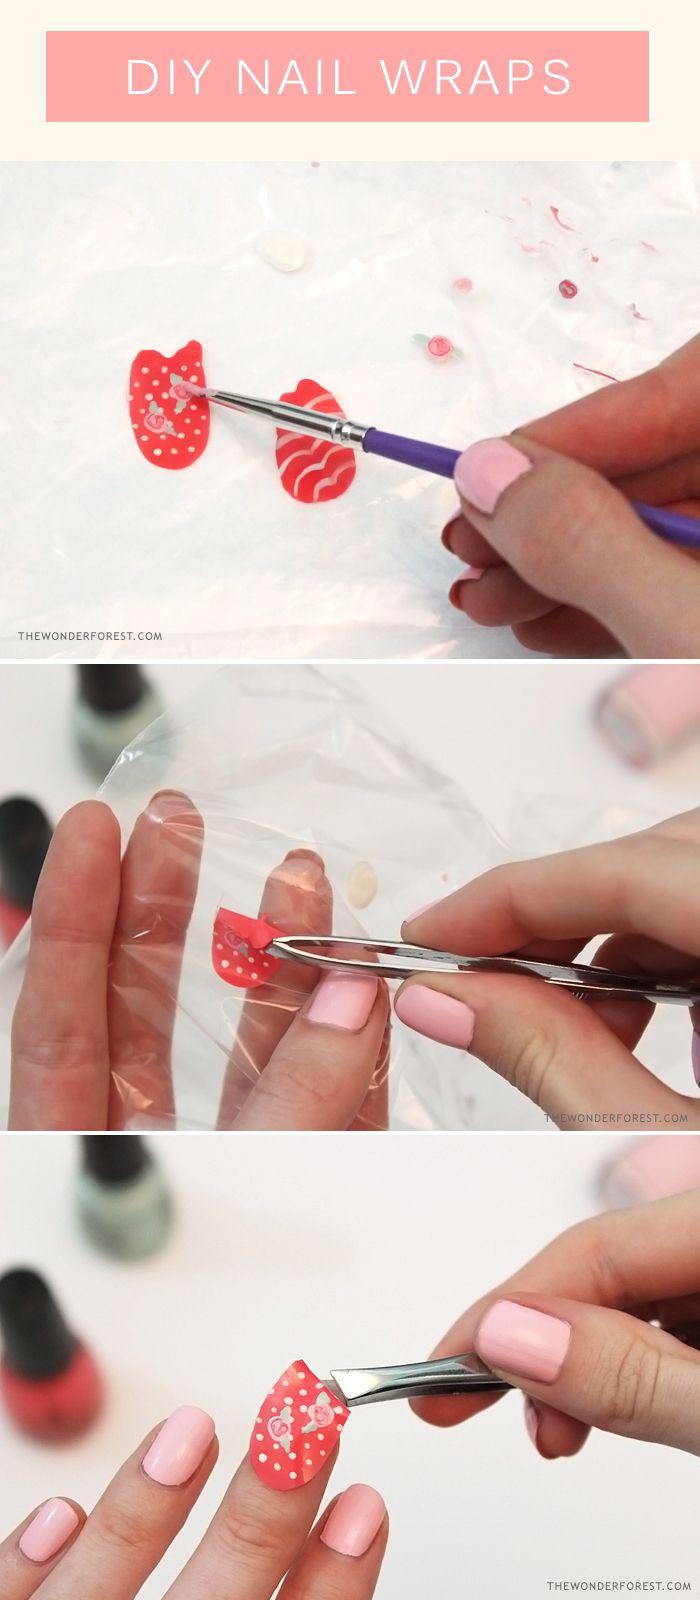 Make Your Own Nail Wraps - Make Your Own Nail Wraps Nail Wraps, Make Your Own And Nails